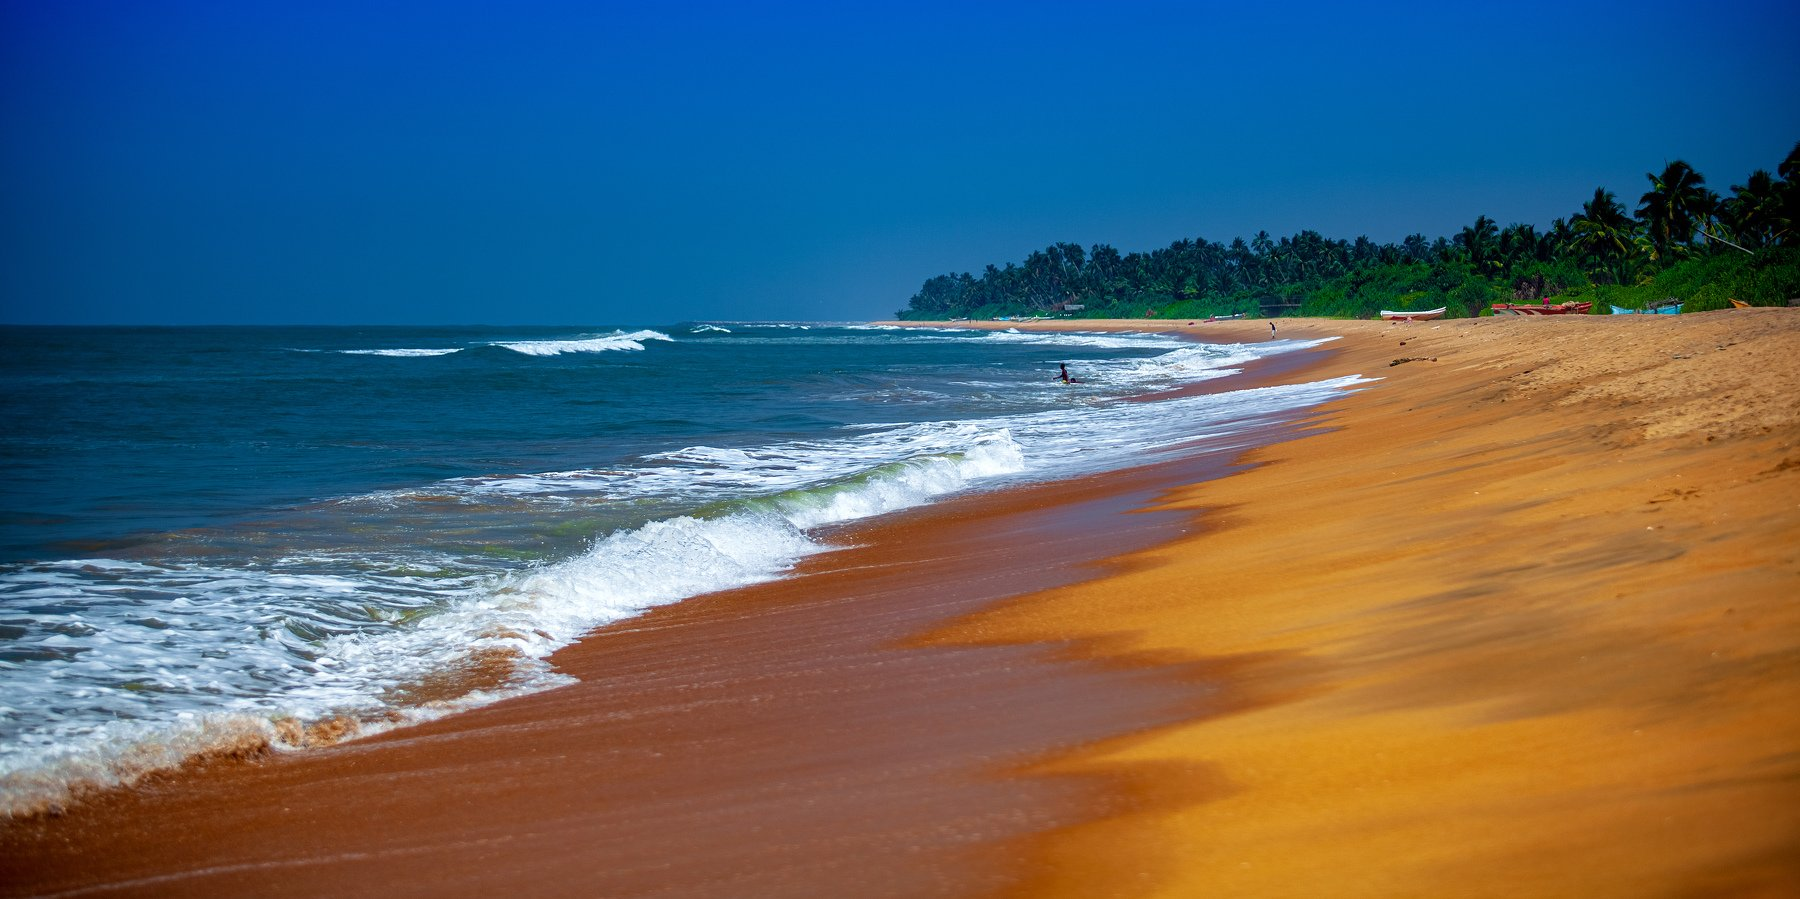 океан, берег, солнце, вода, волна, Игнатьев Александр